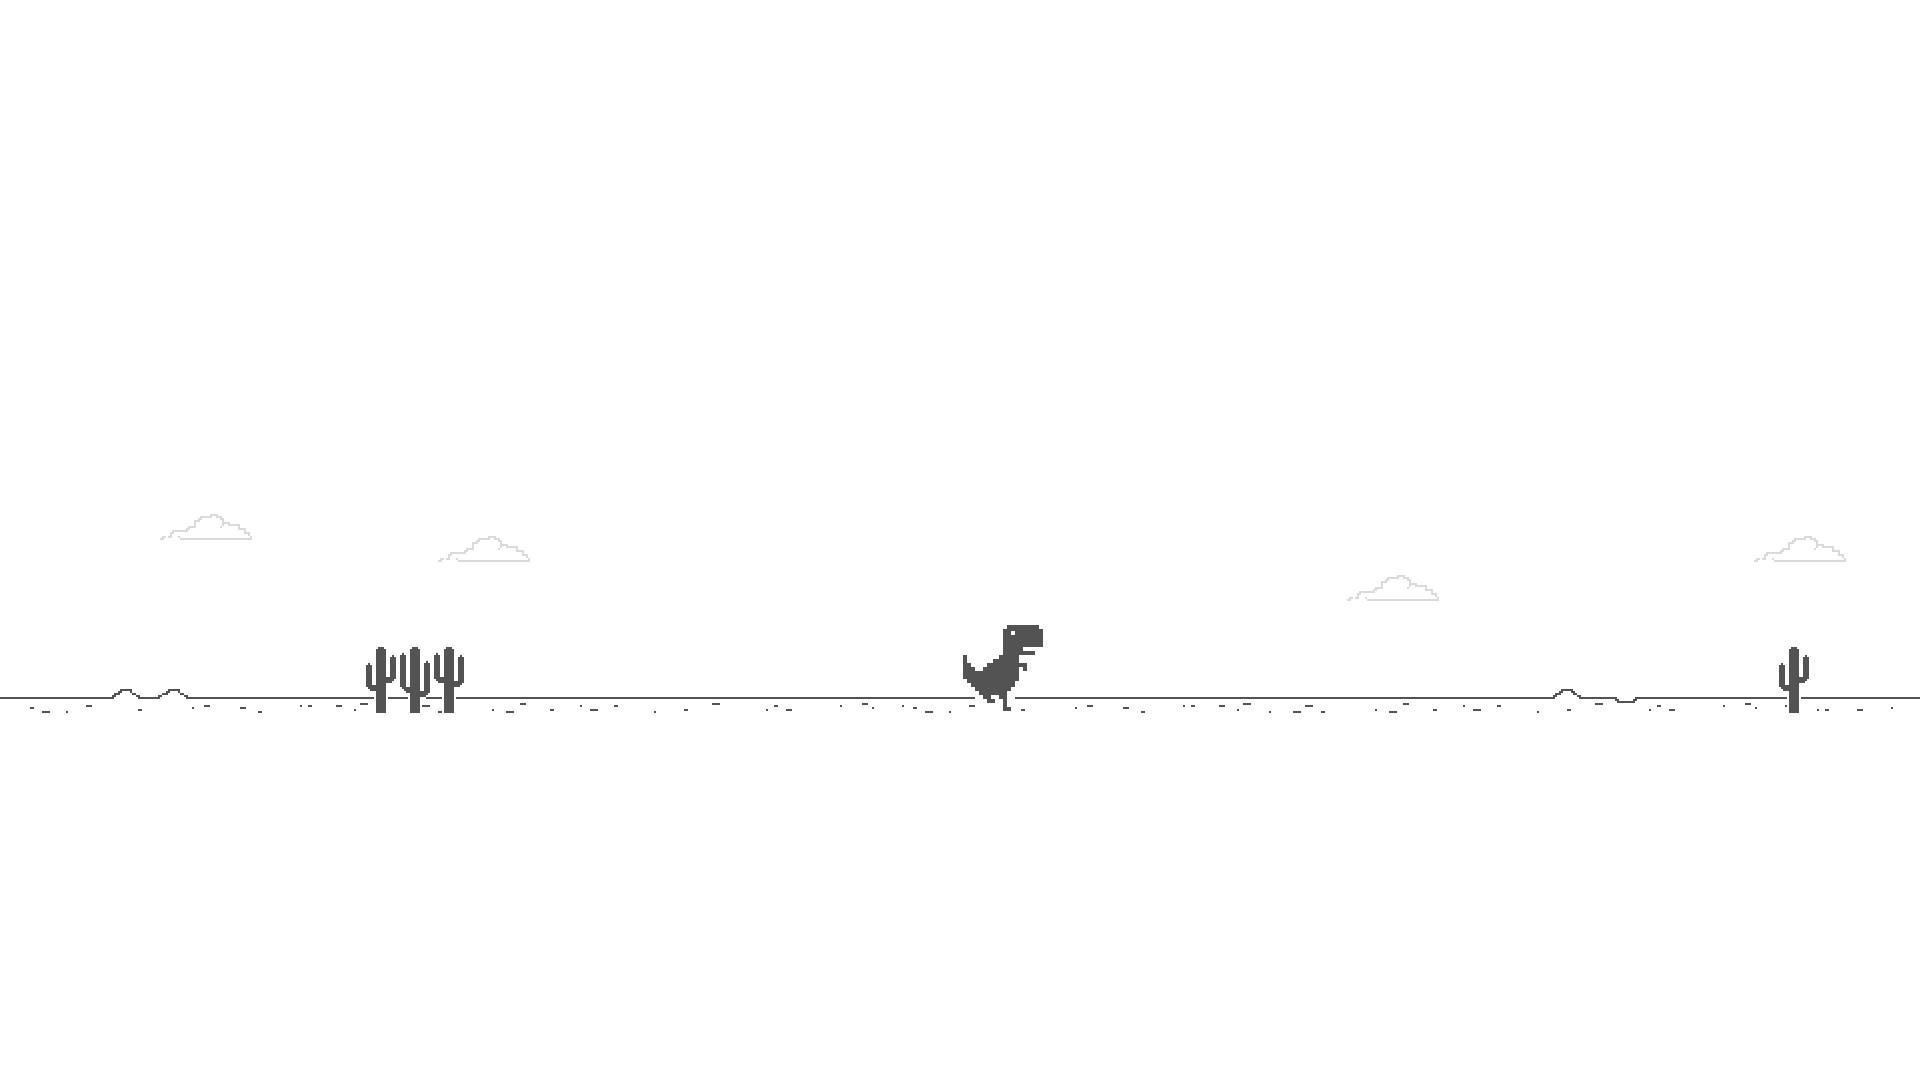 Google Dino